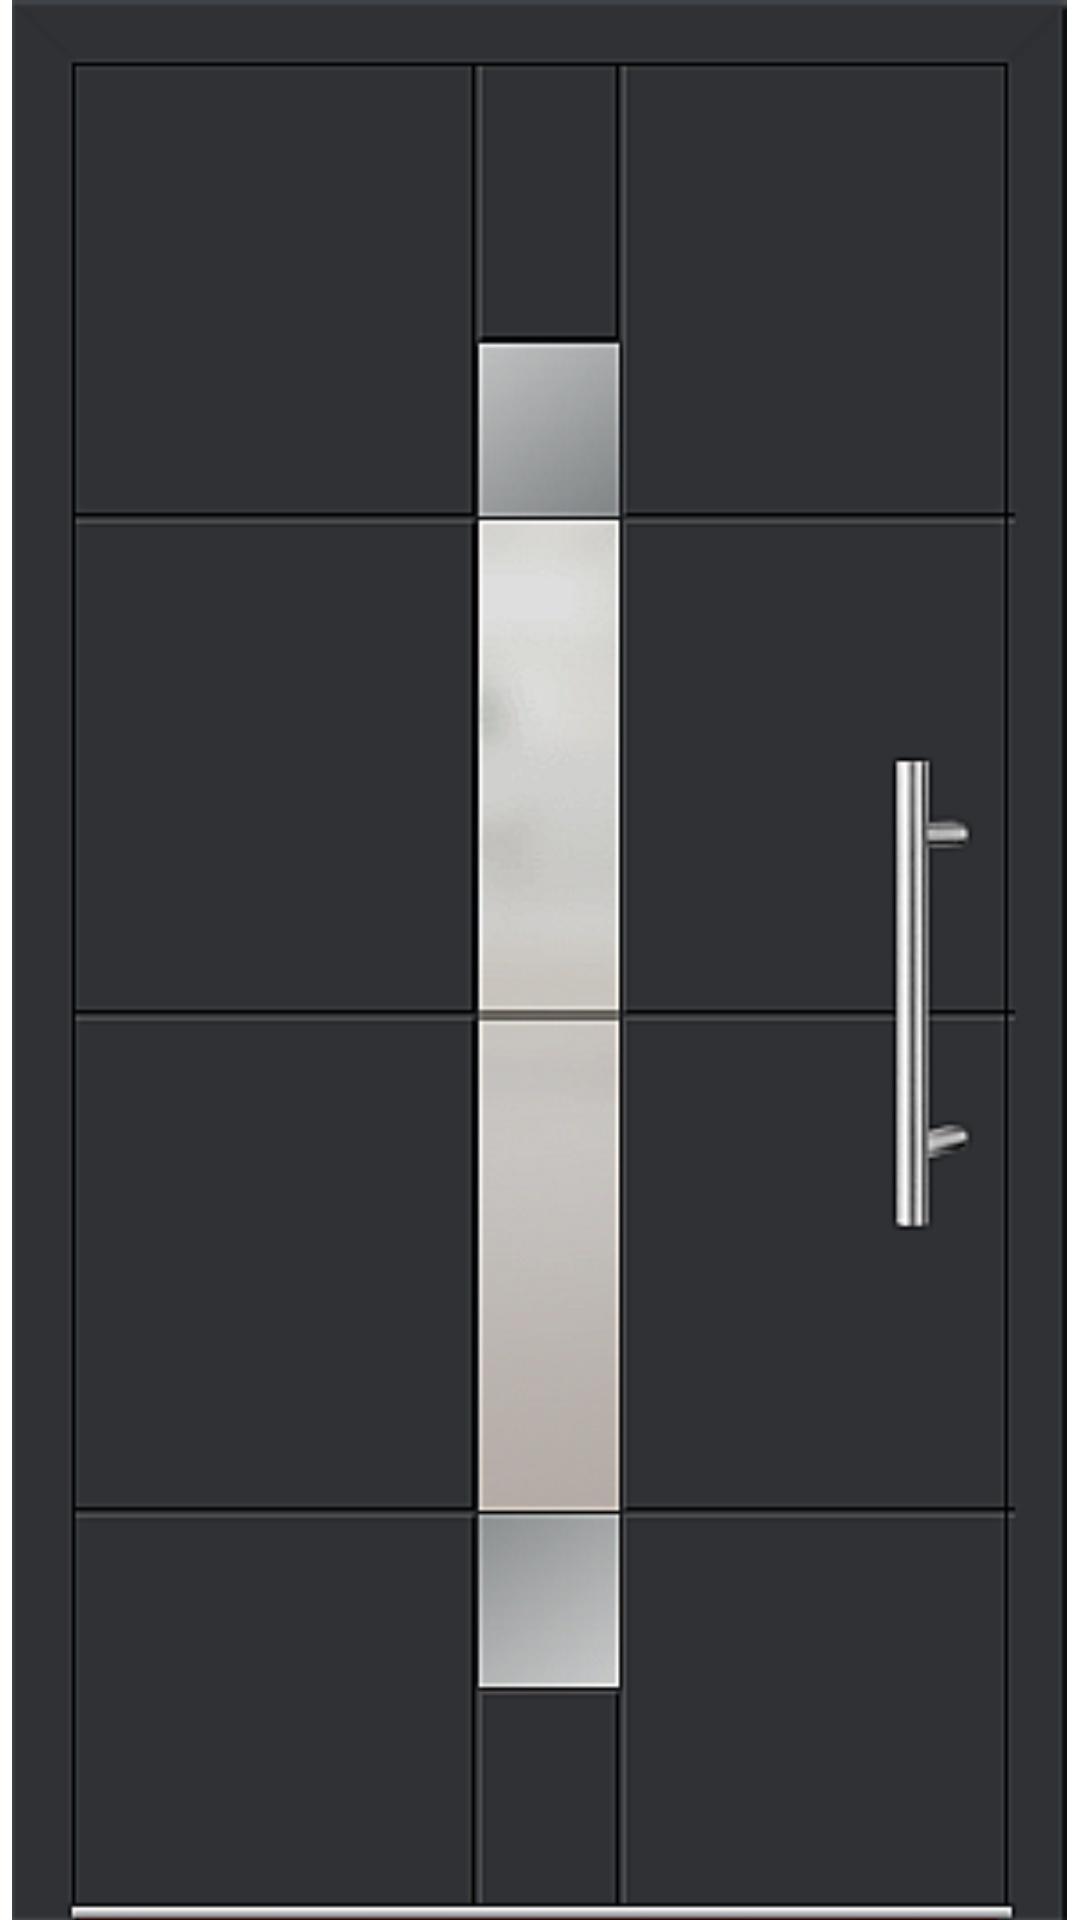 Aluminium Haustür Modell 6347-57 schwarz